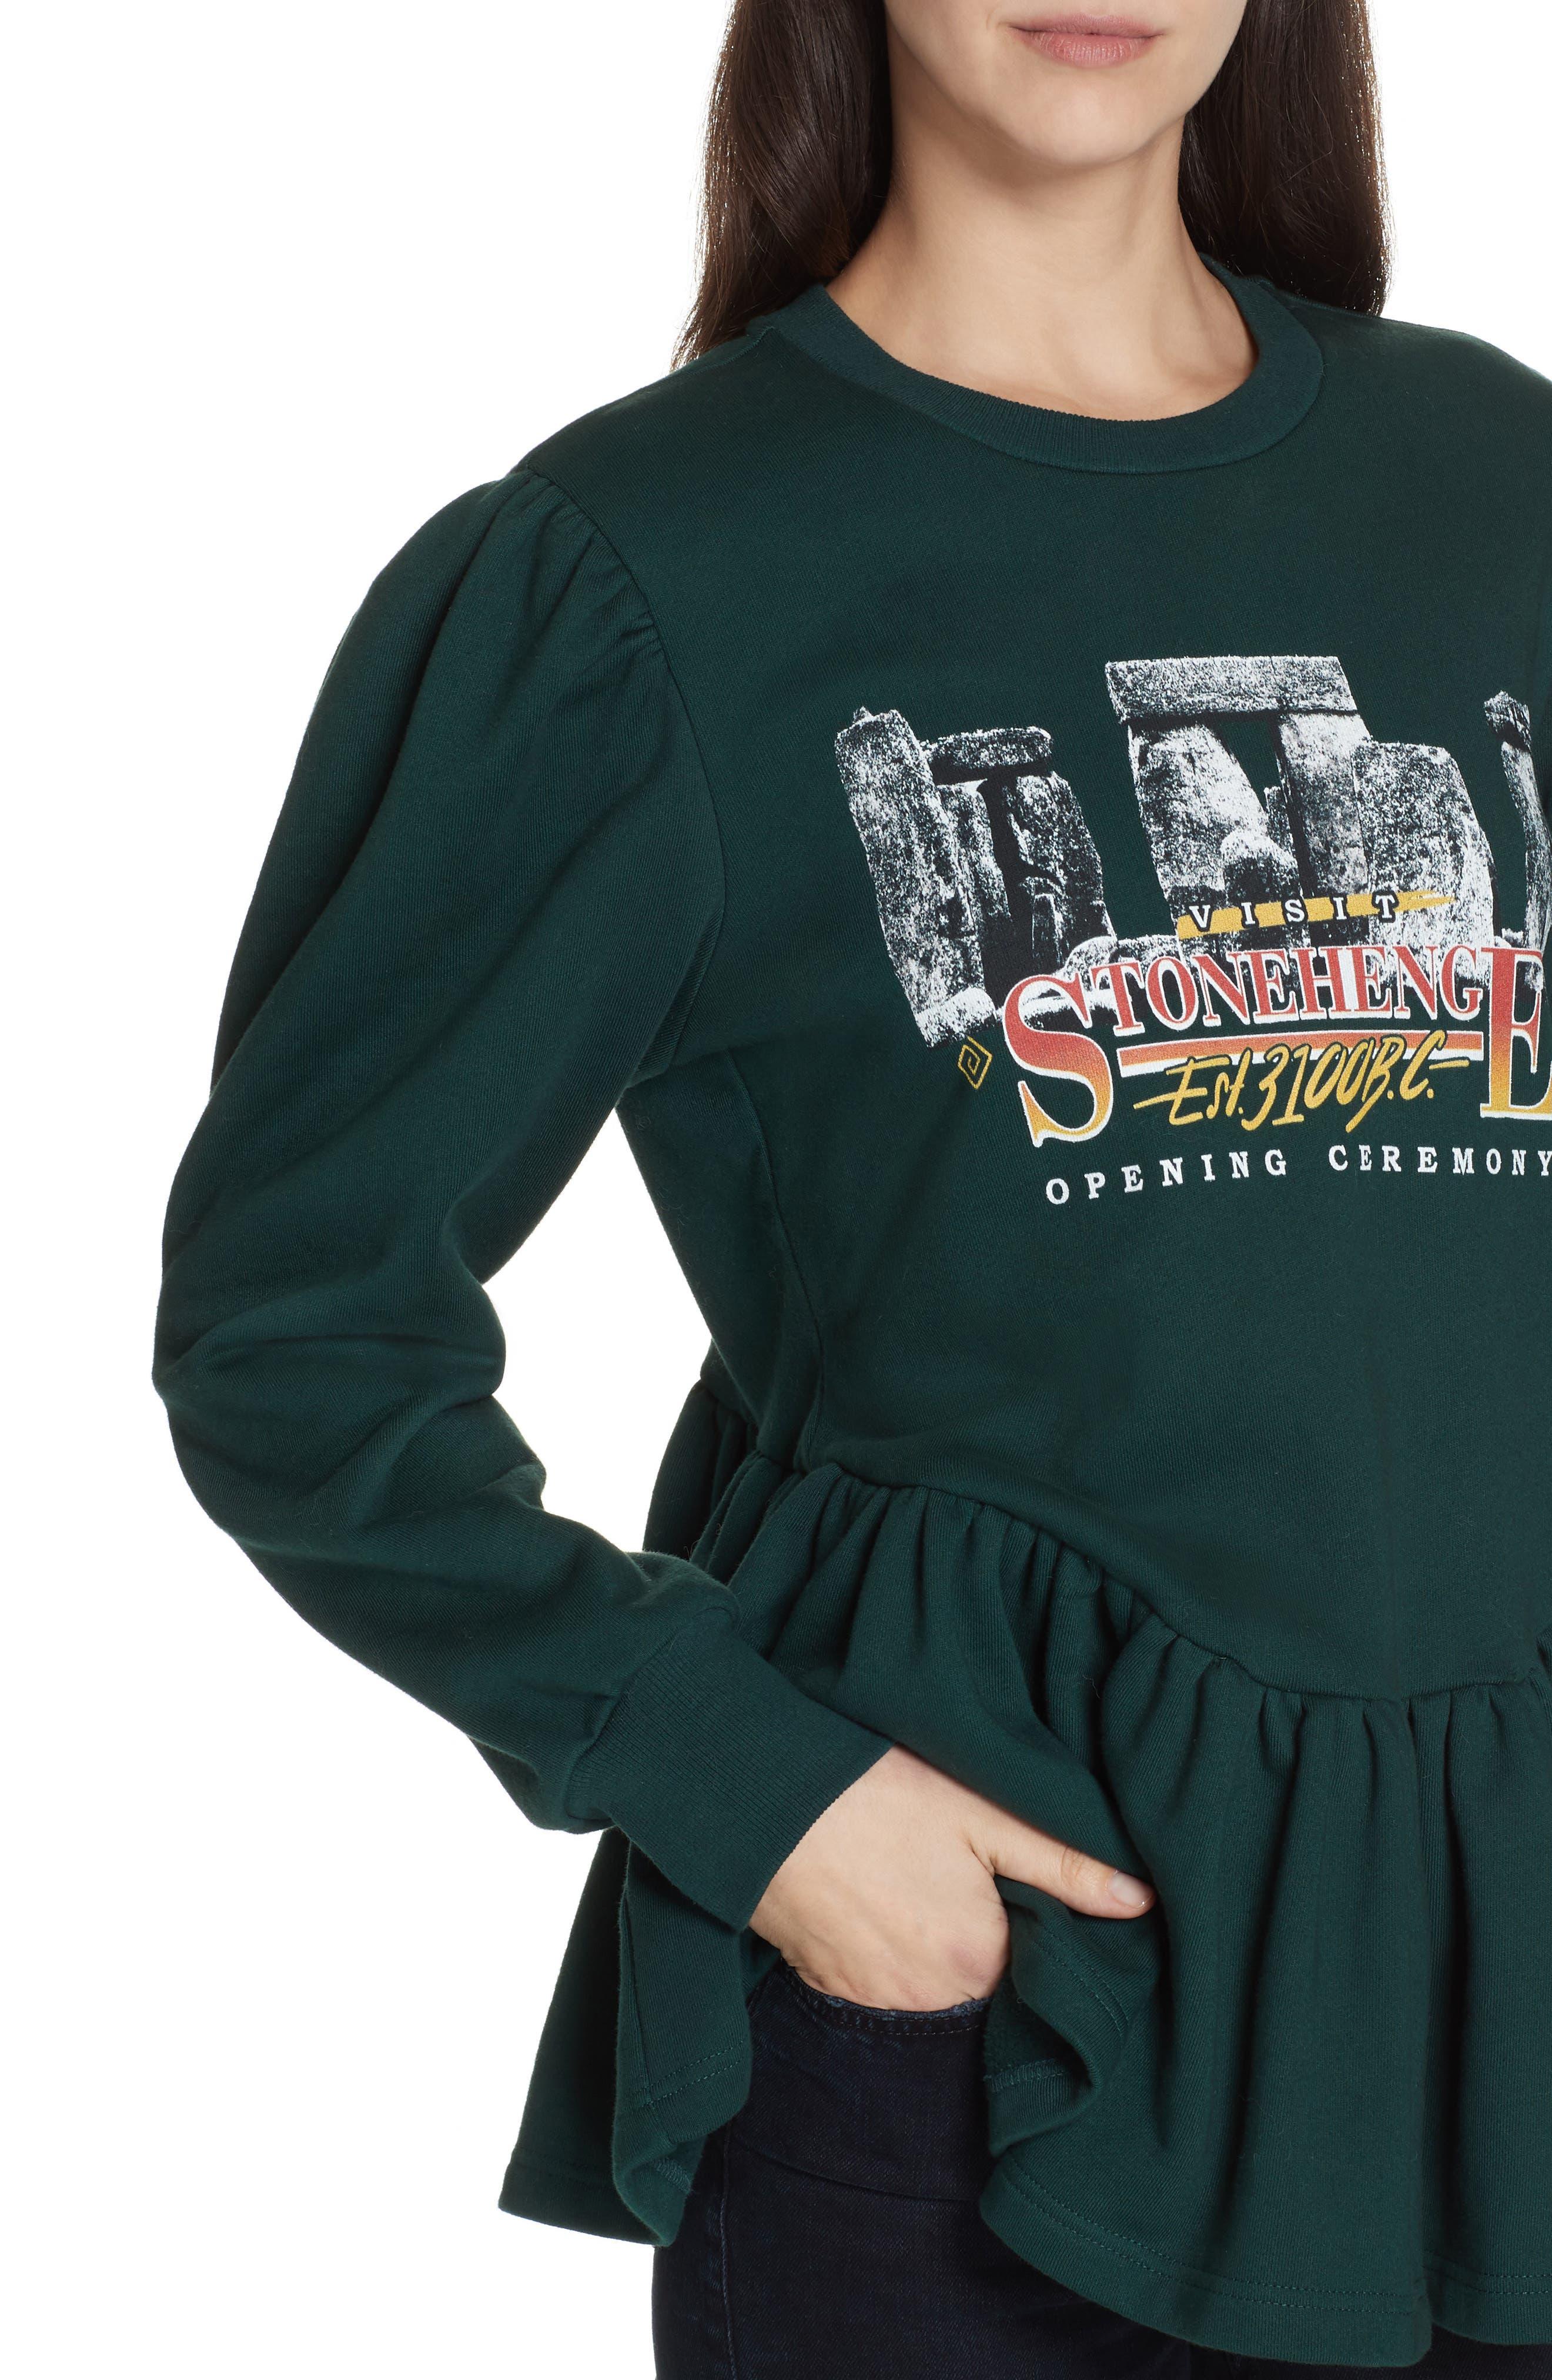 Stonehenge Graphic Peplum Sweatshirt,                             Alternate thumbnail 4, color,                             SALEM